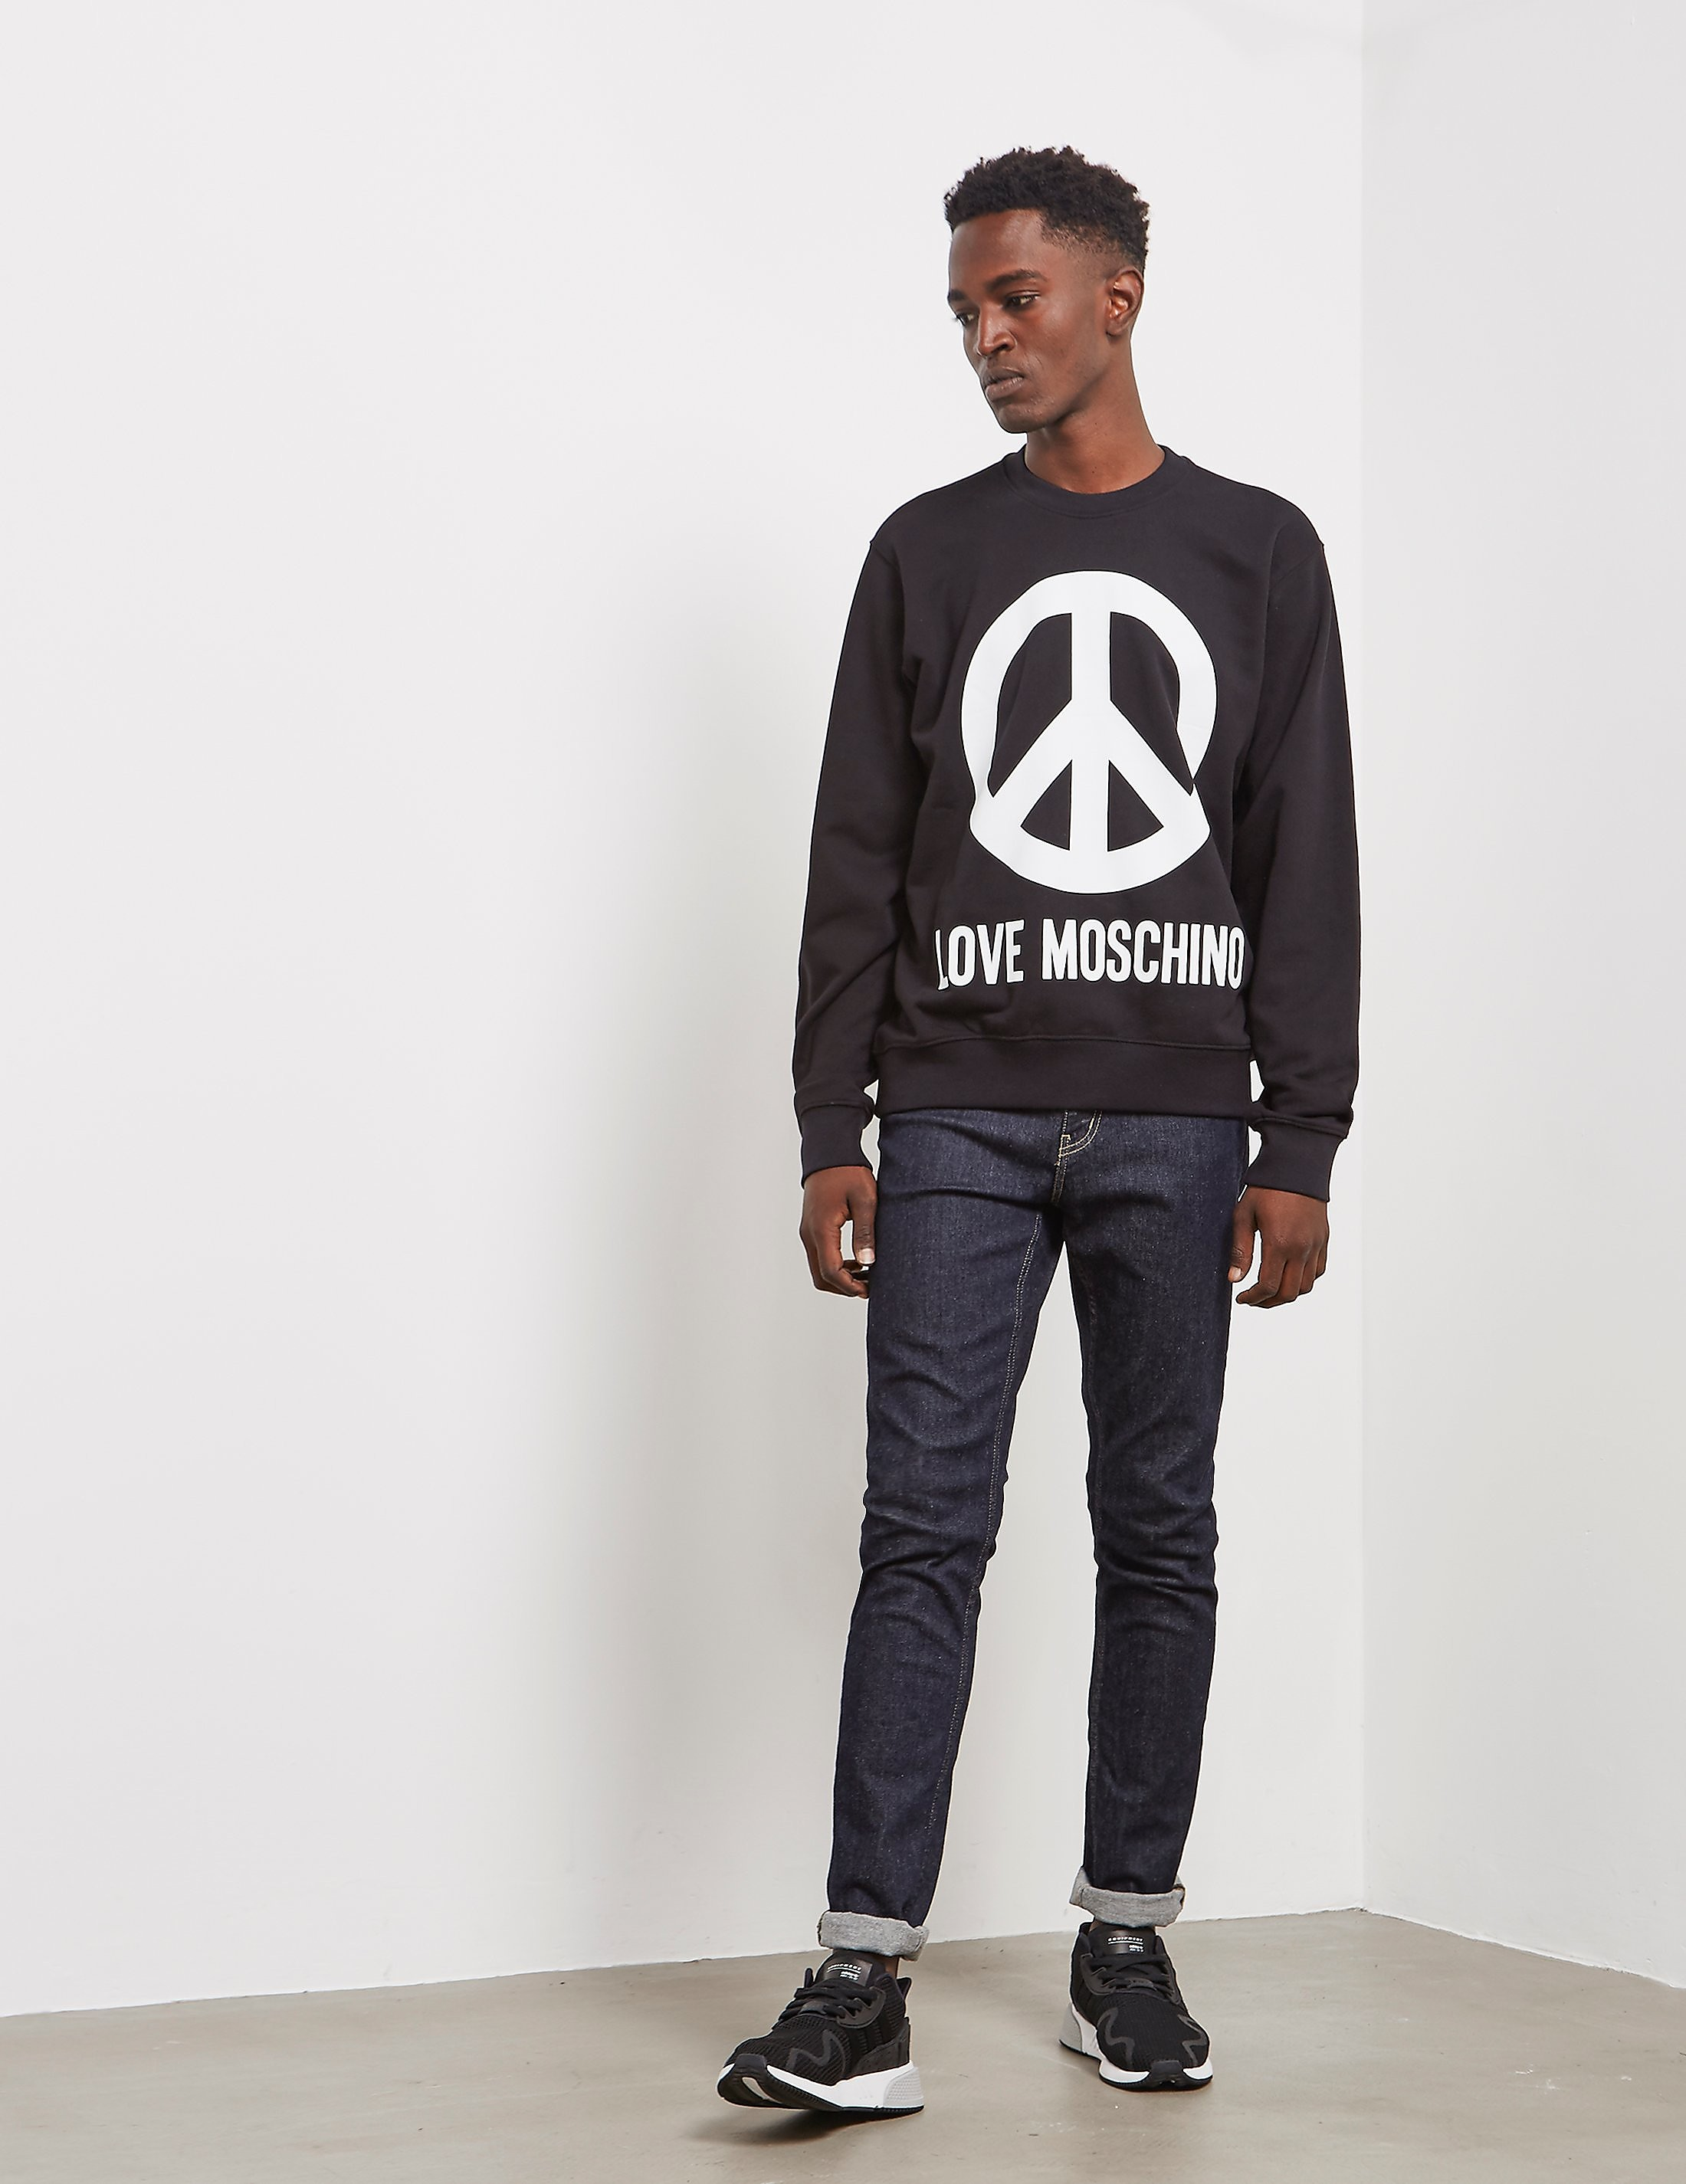 Love Moschino Large Peace Sweatshirt Love Moschino Large Peace Sweatshirt